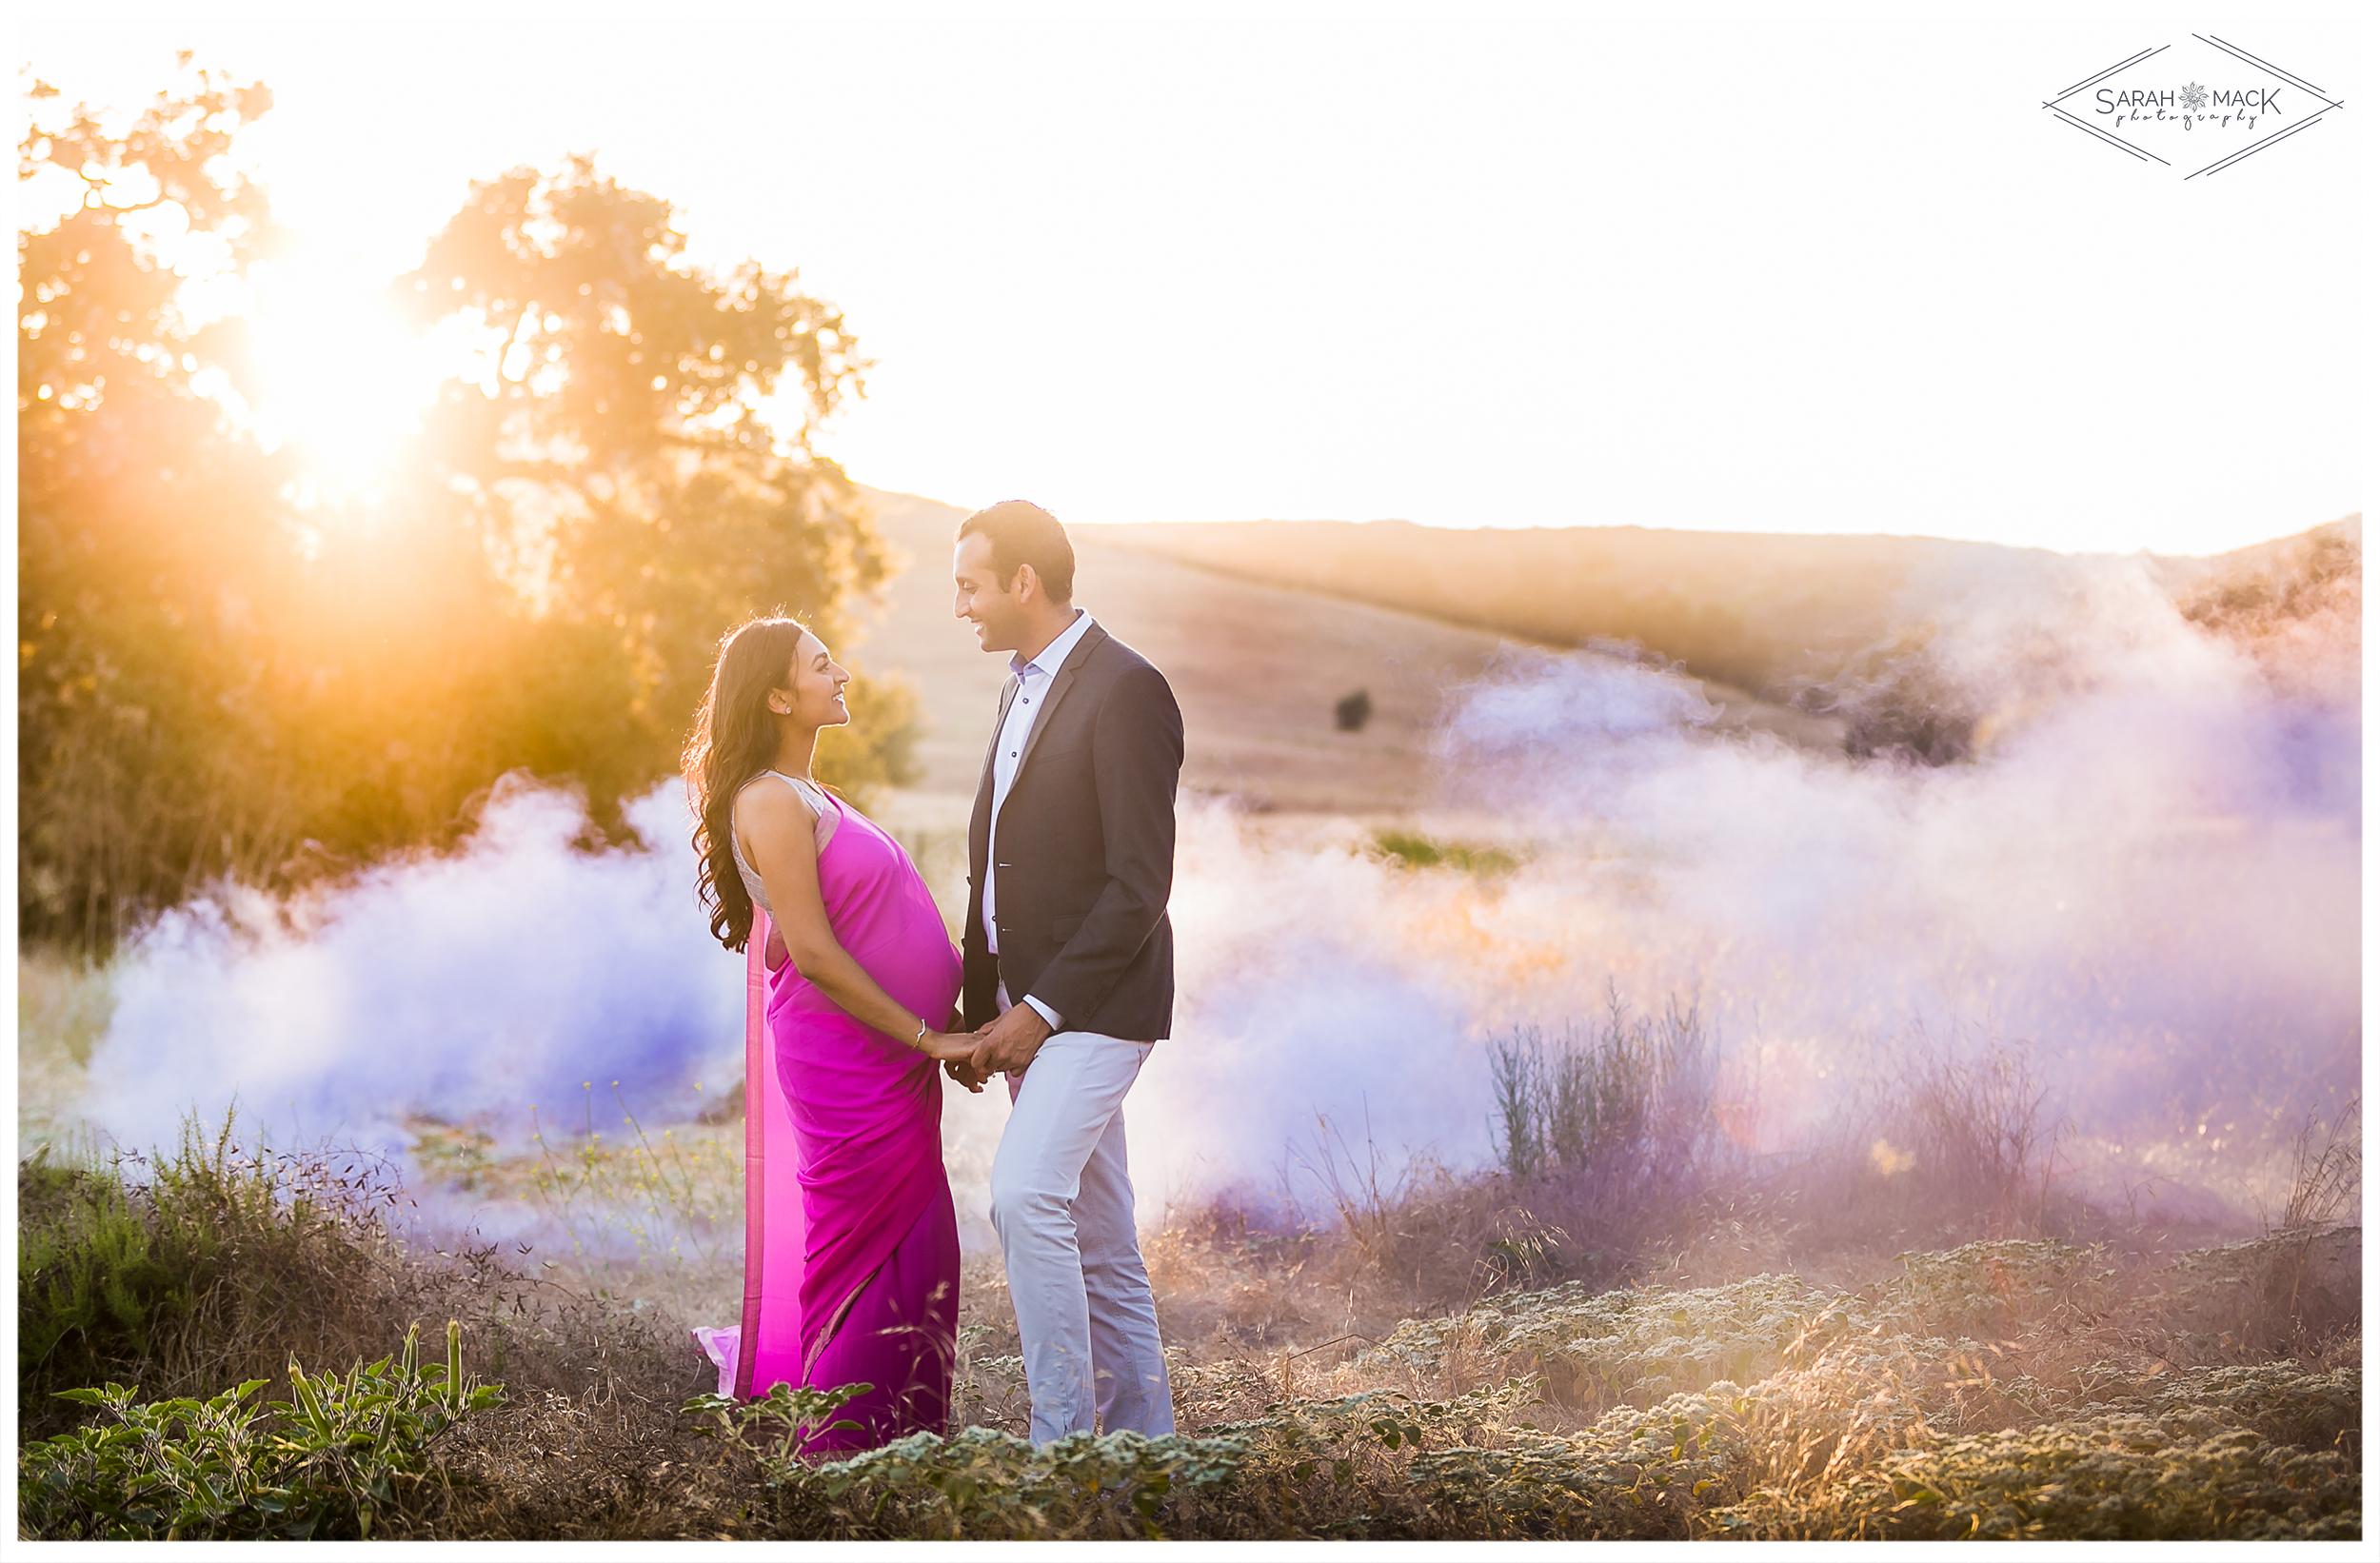 SA-Orange-County-Maternity-Photography-8.jpg